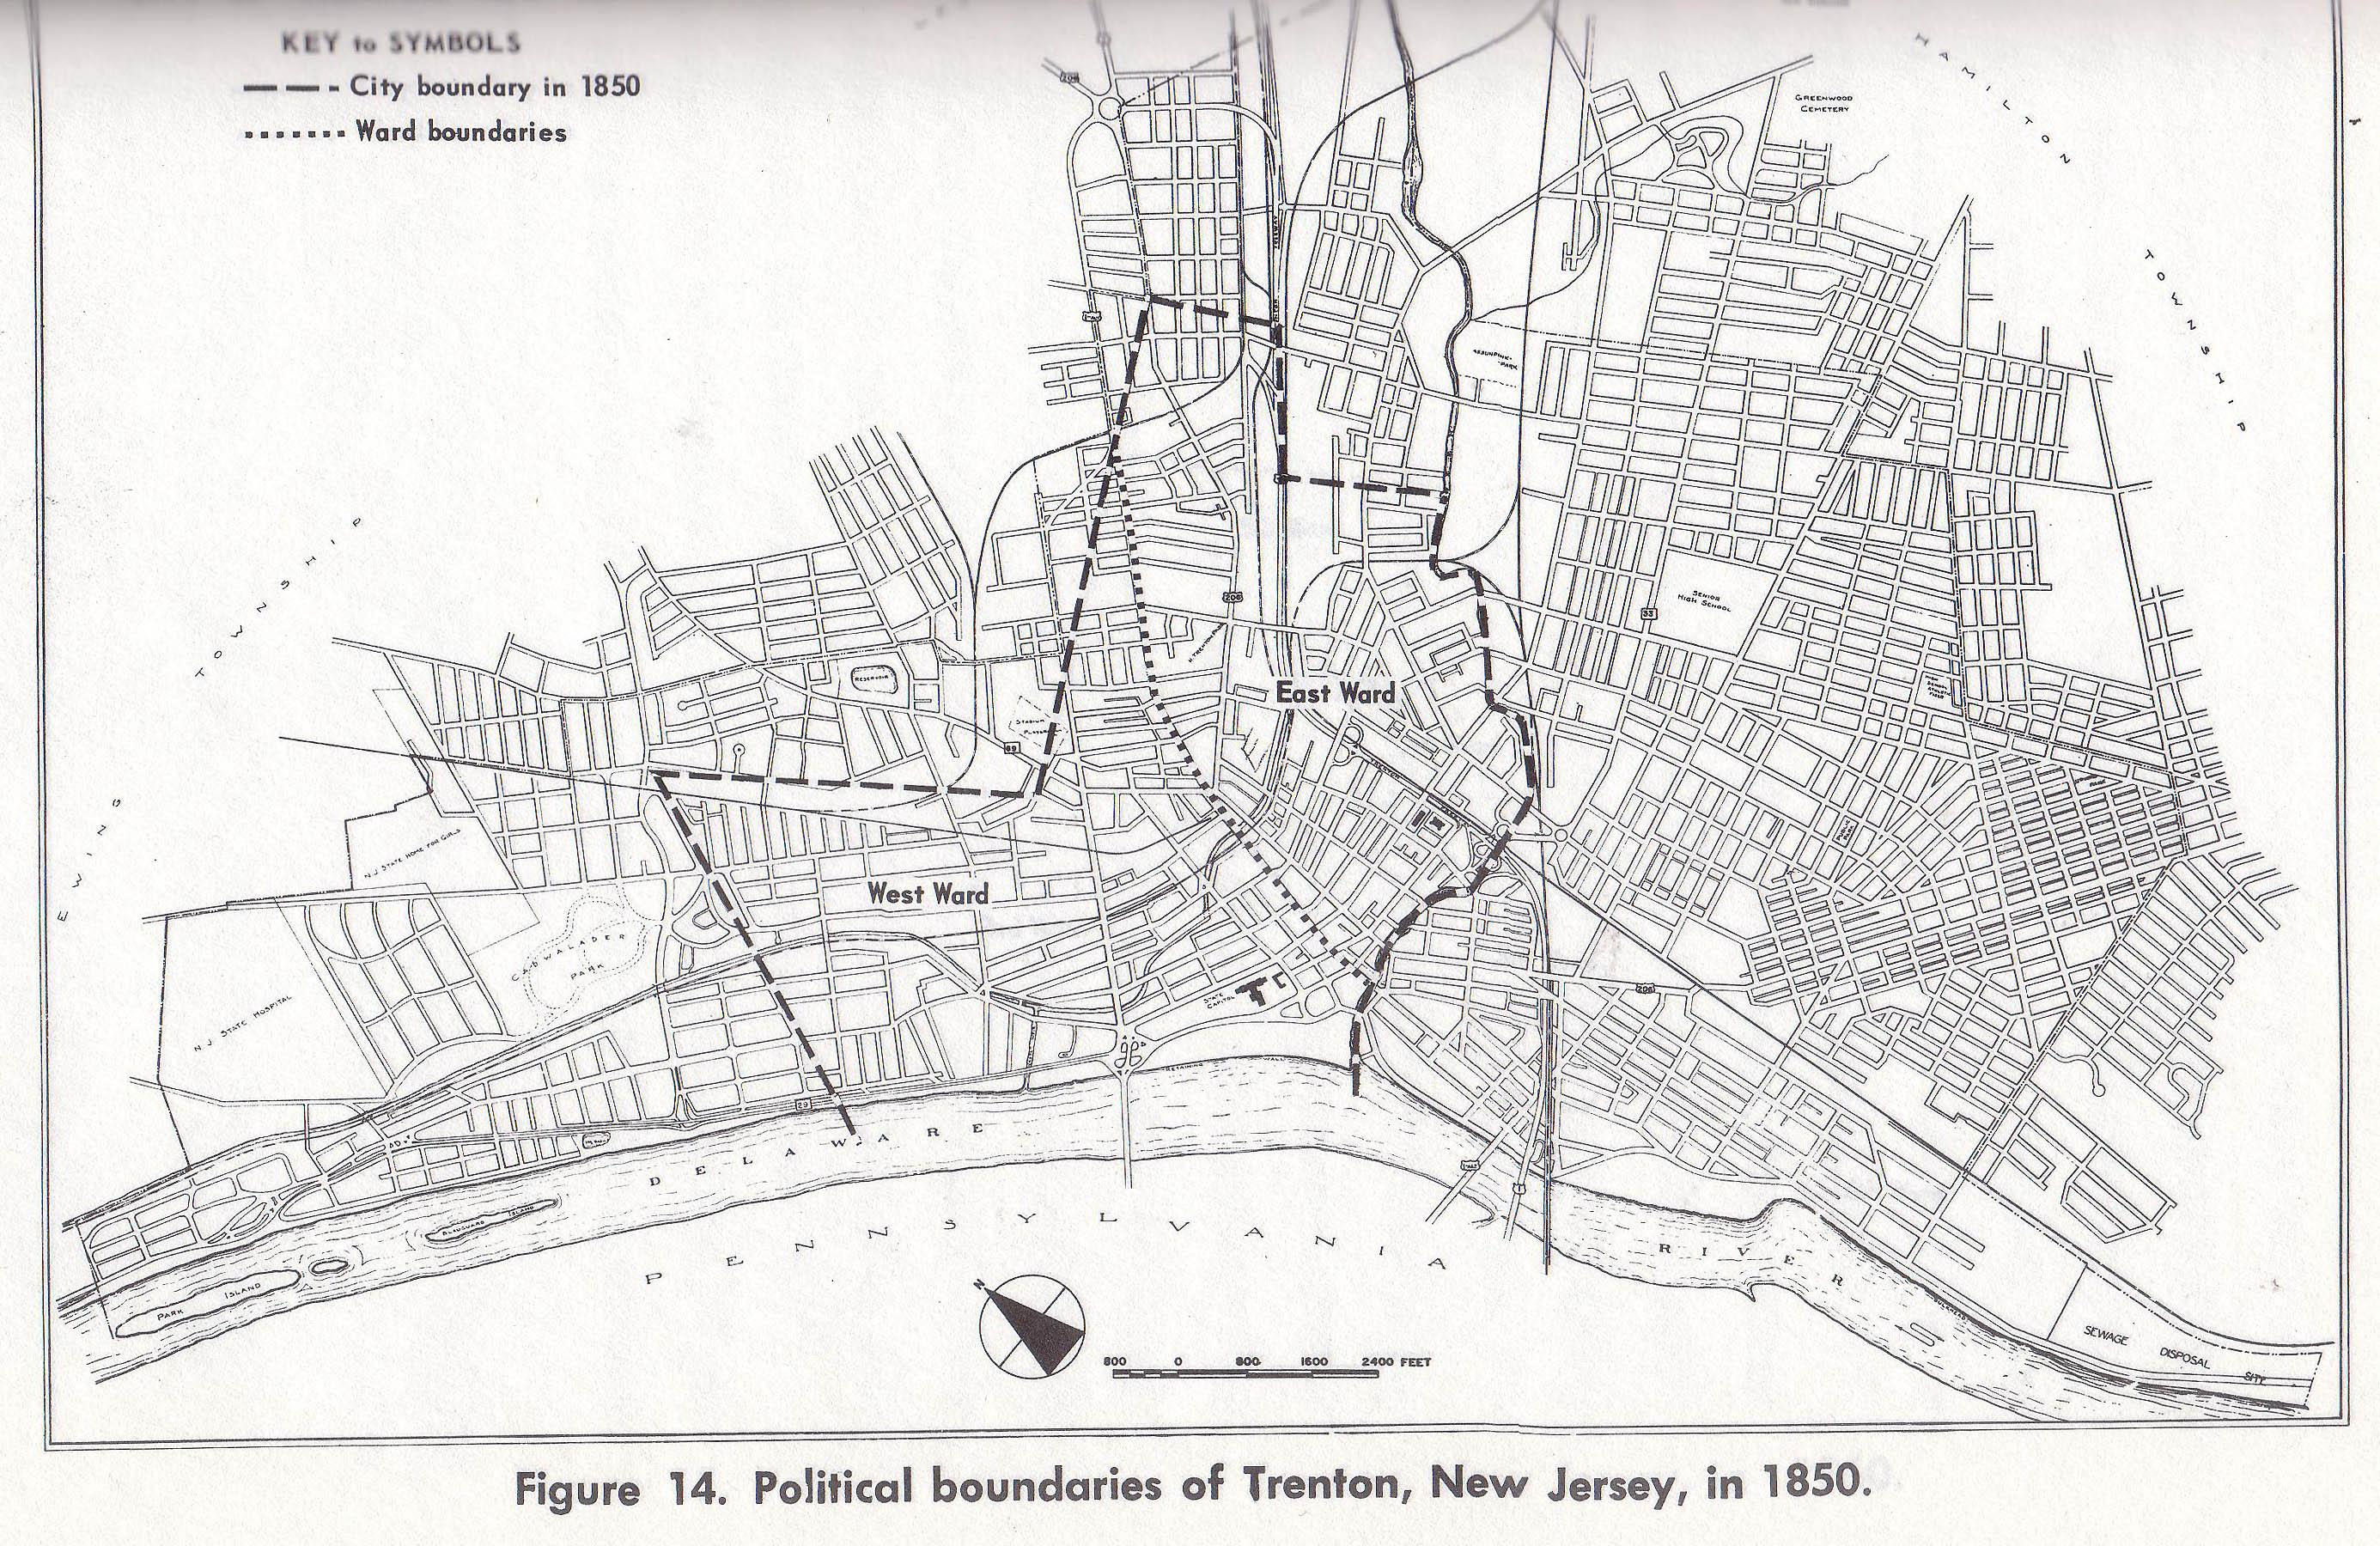 Map Of Trenton Nj Trenton Historical Society, New Jersey Map Of Trenton Nj